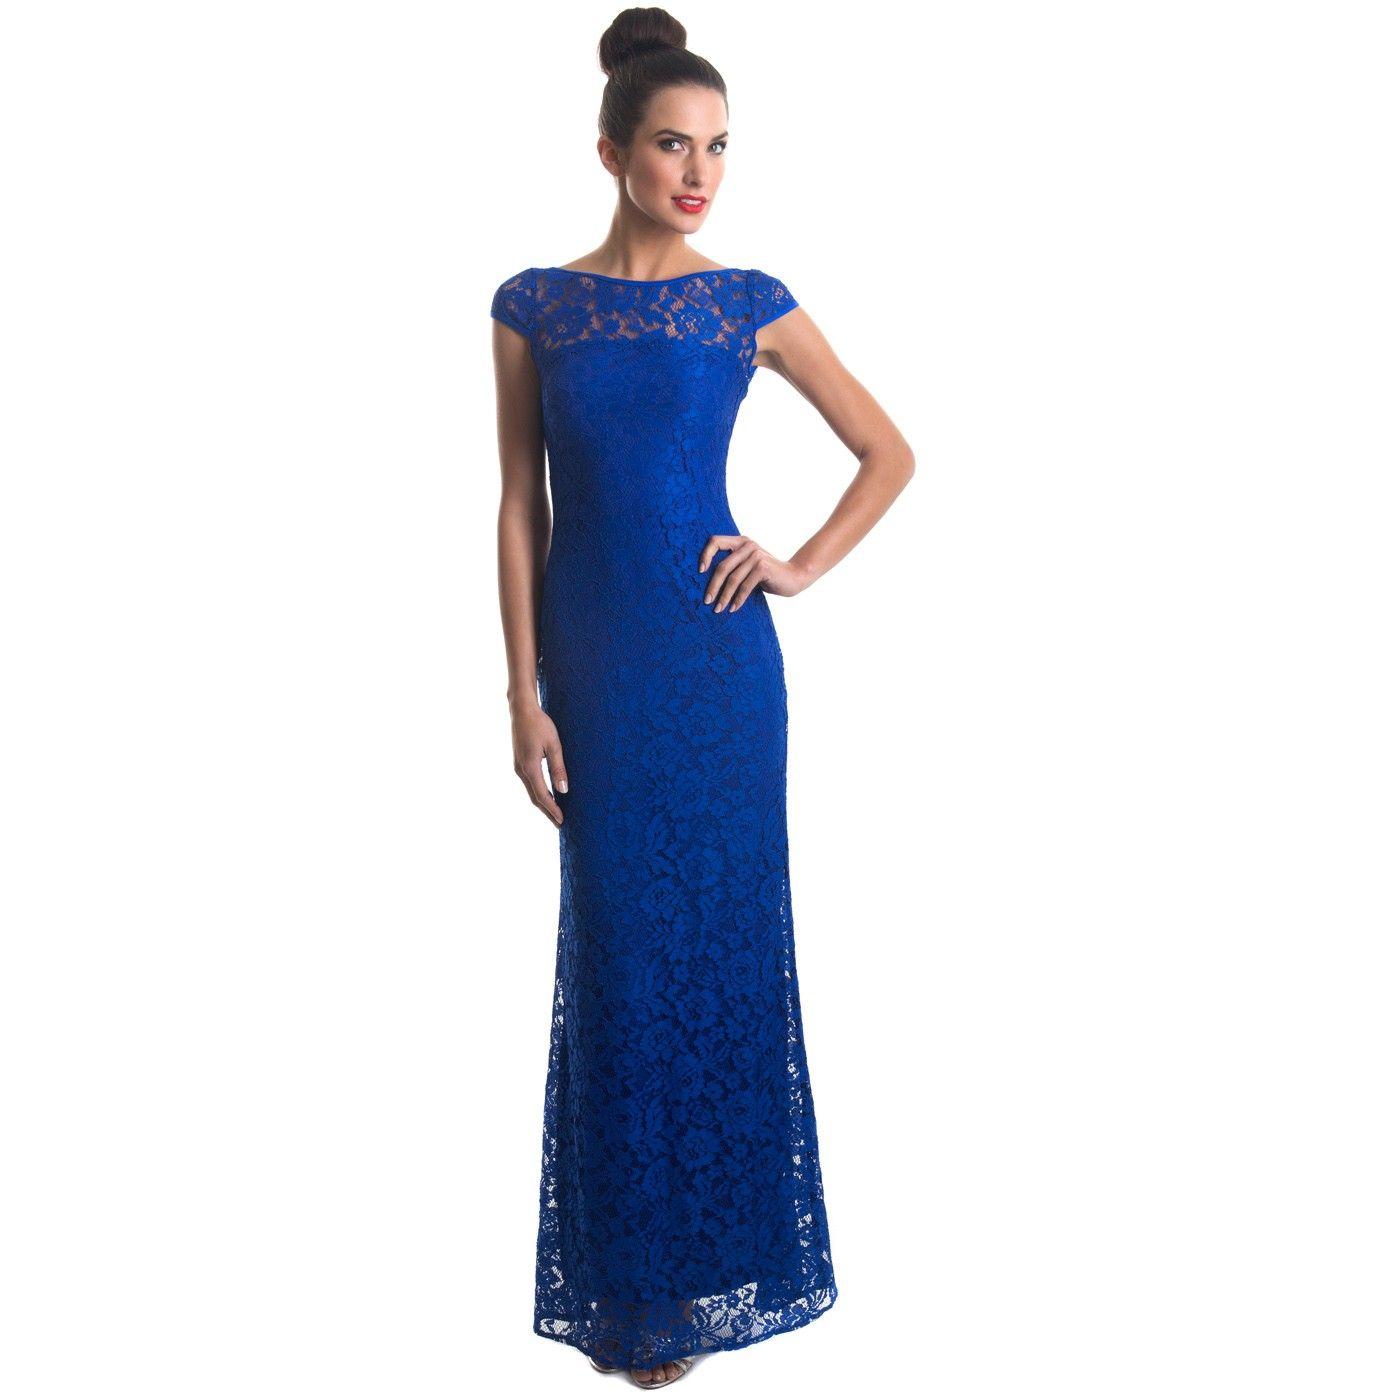 Jadore J9106 Erica Dress | Dresses, Buy bridesmaid dresses